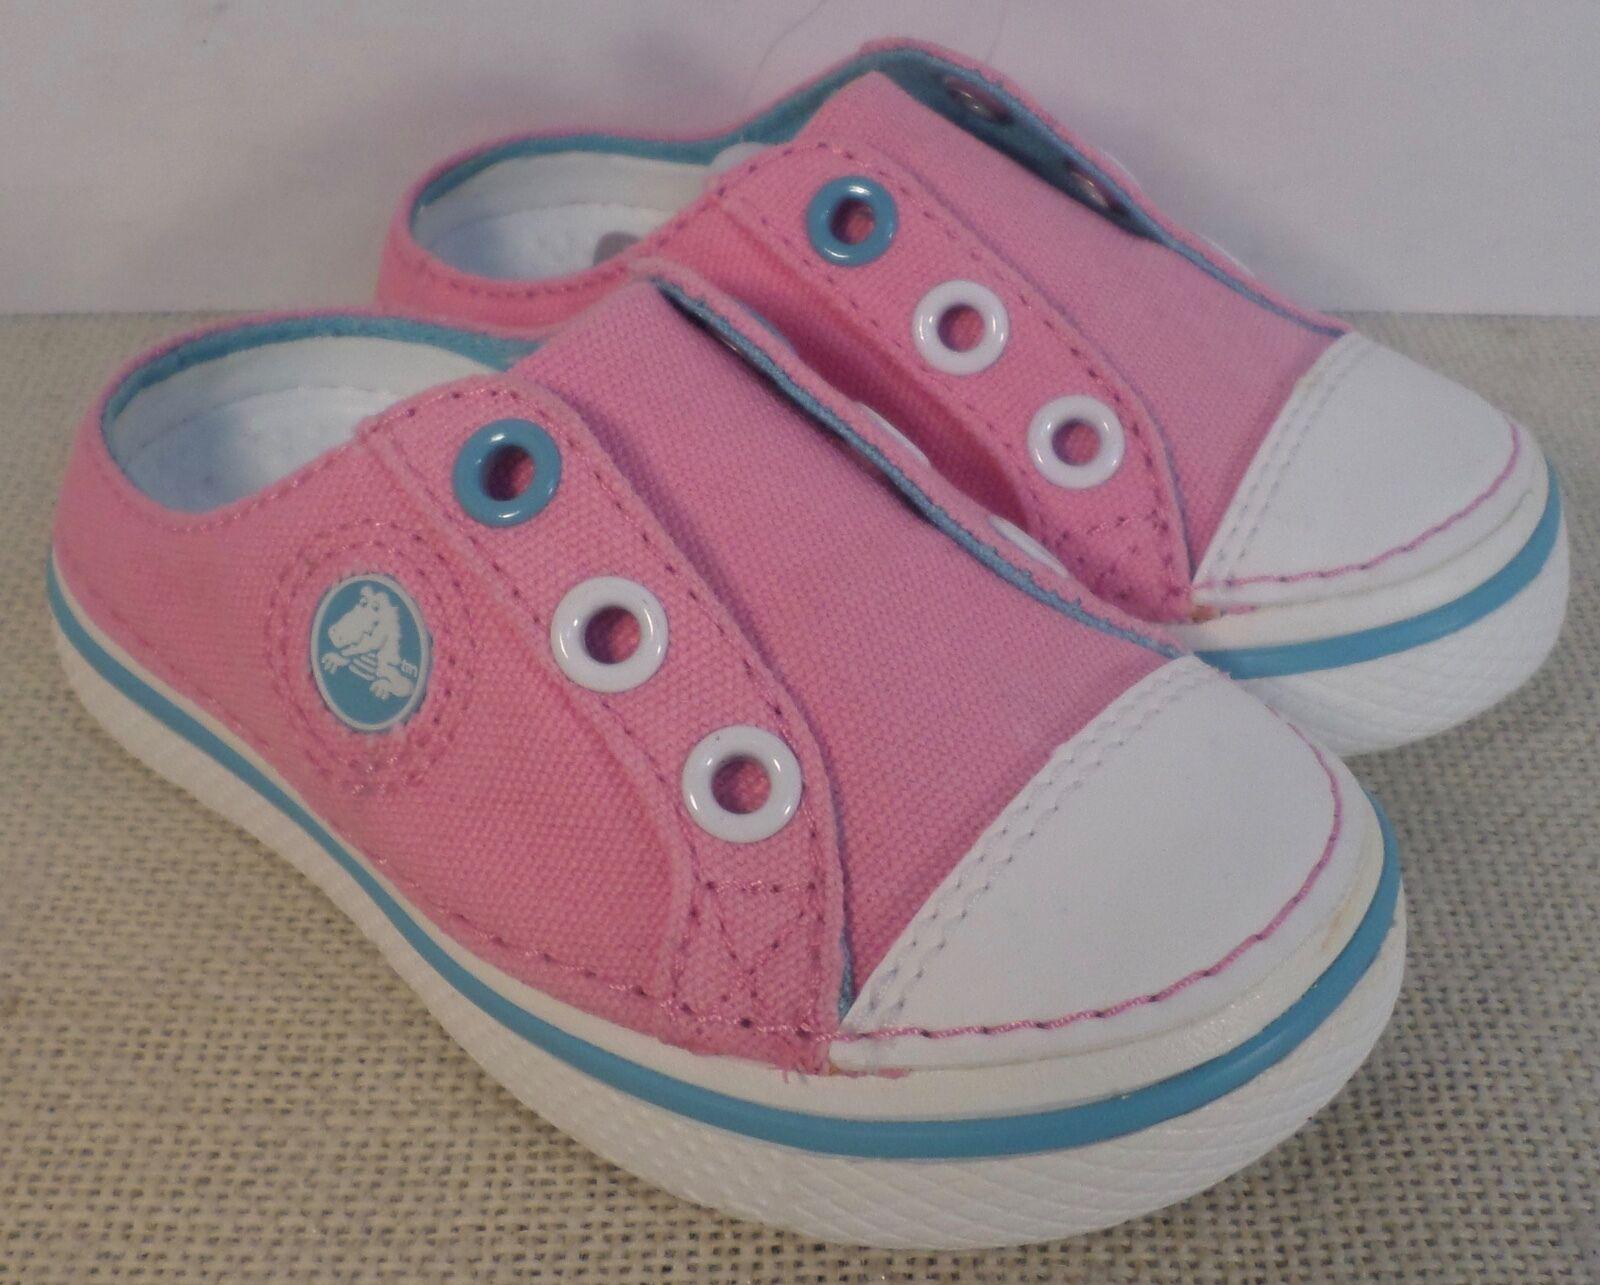 CROCS INFANTS HOVER SLIP ON CLOG PINK LEMONADE AQUA SHOES NEW WITH TAGS